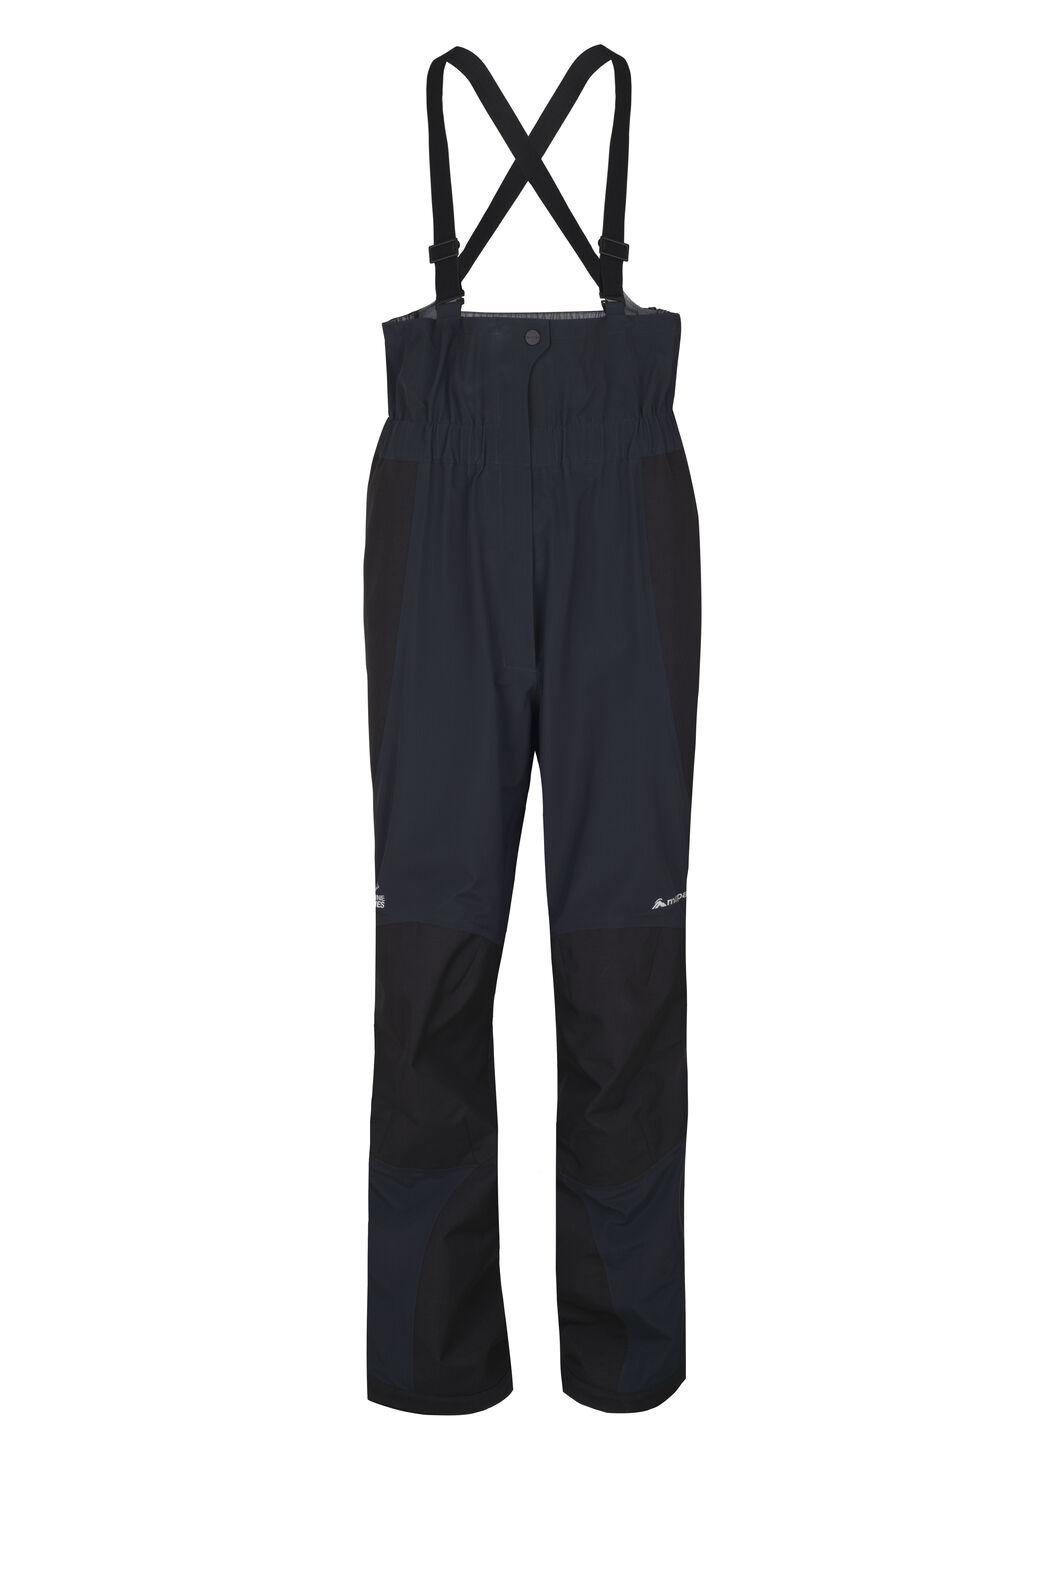 Macpac Women's Barrier Bib Pertex® Rain Pants, Black, hi-res